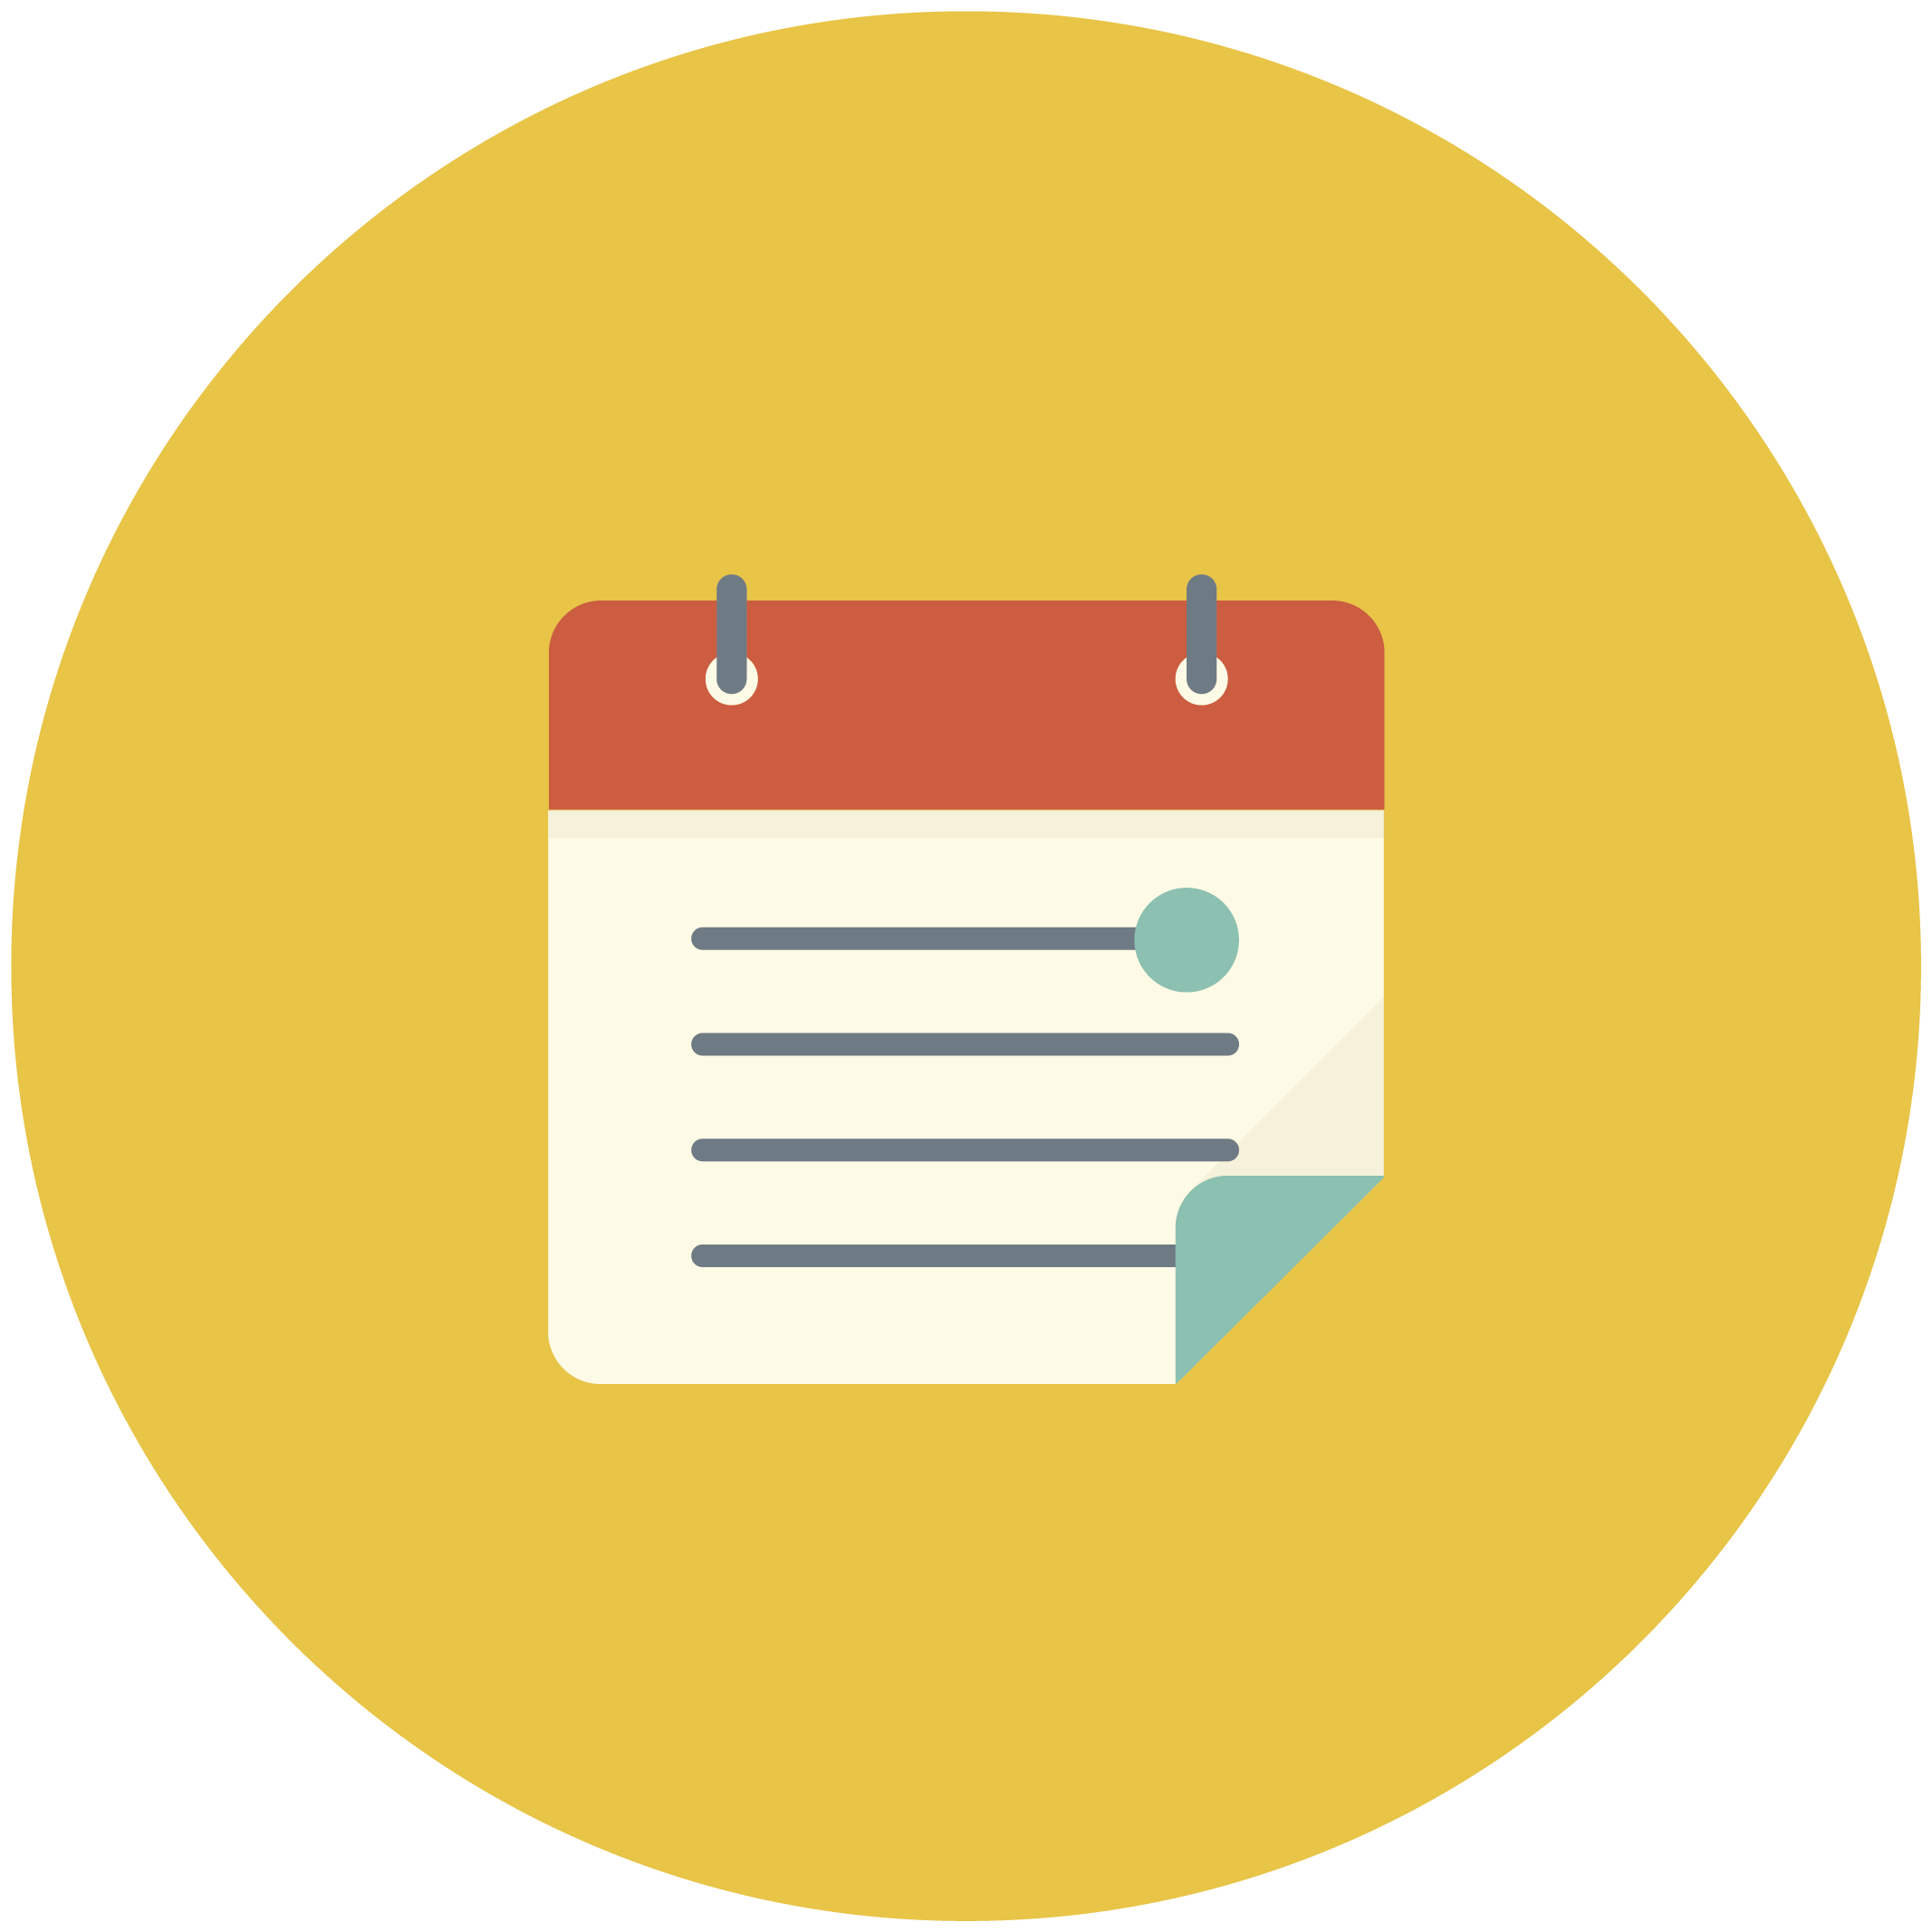 Calendar Illustration Png : Calendar schedule date month event day graficheria icon